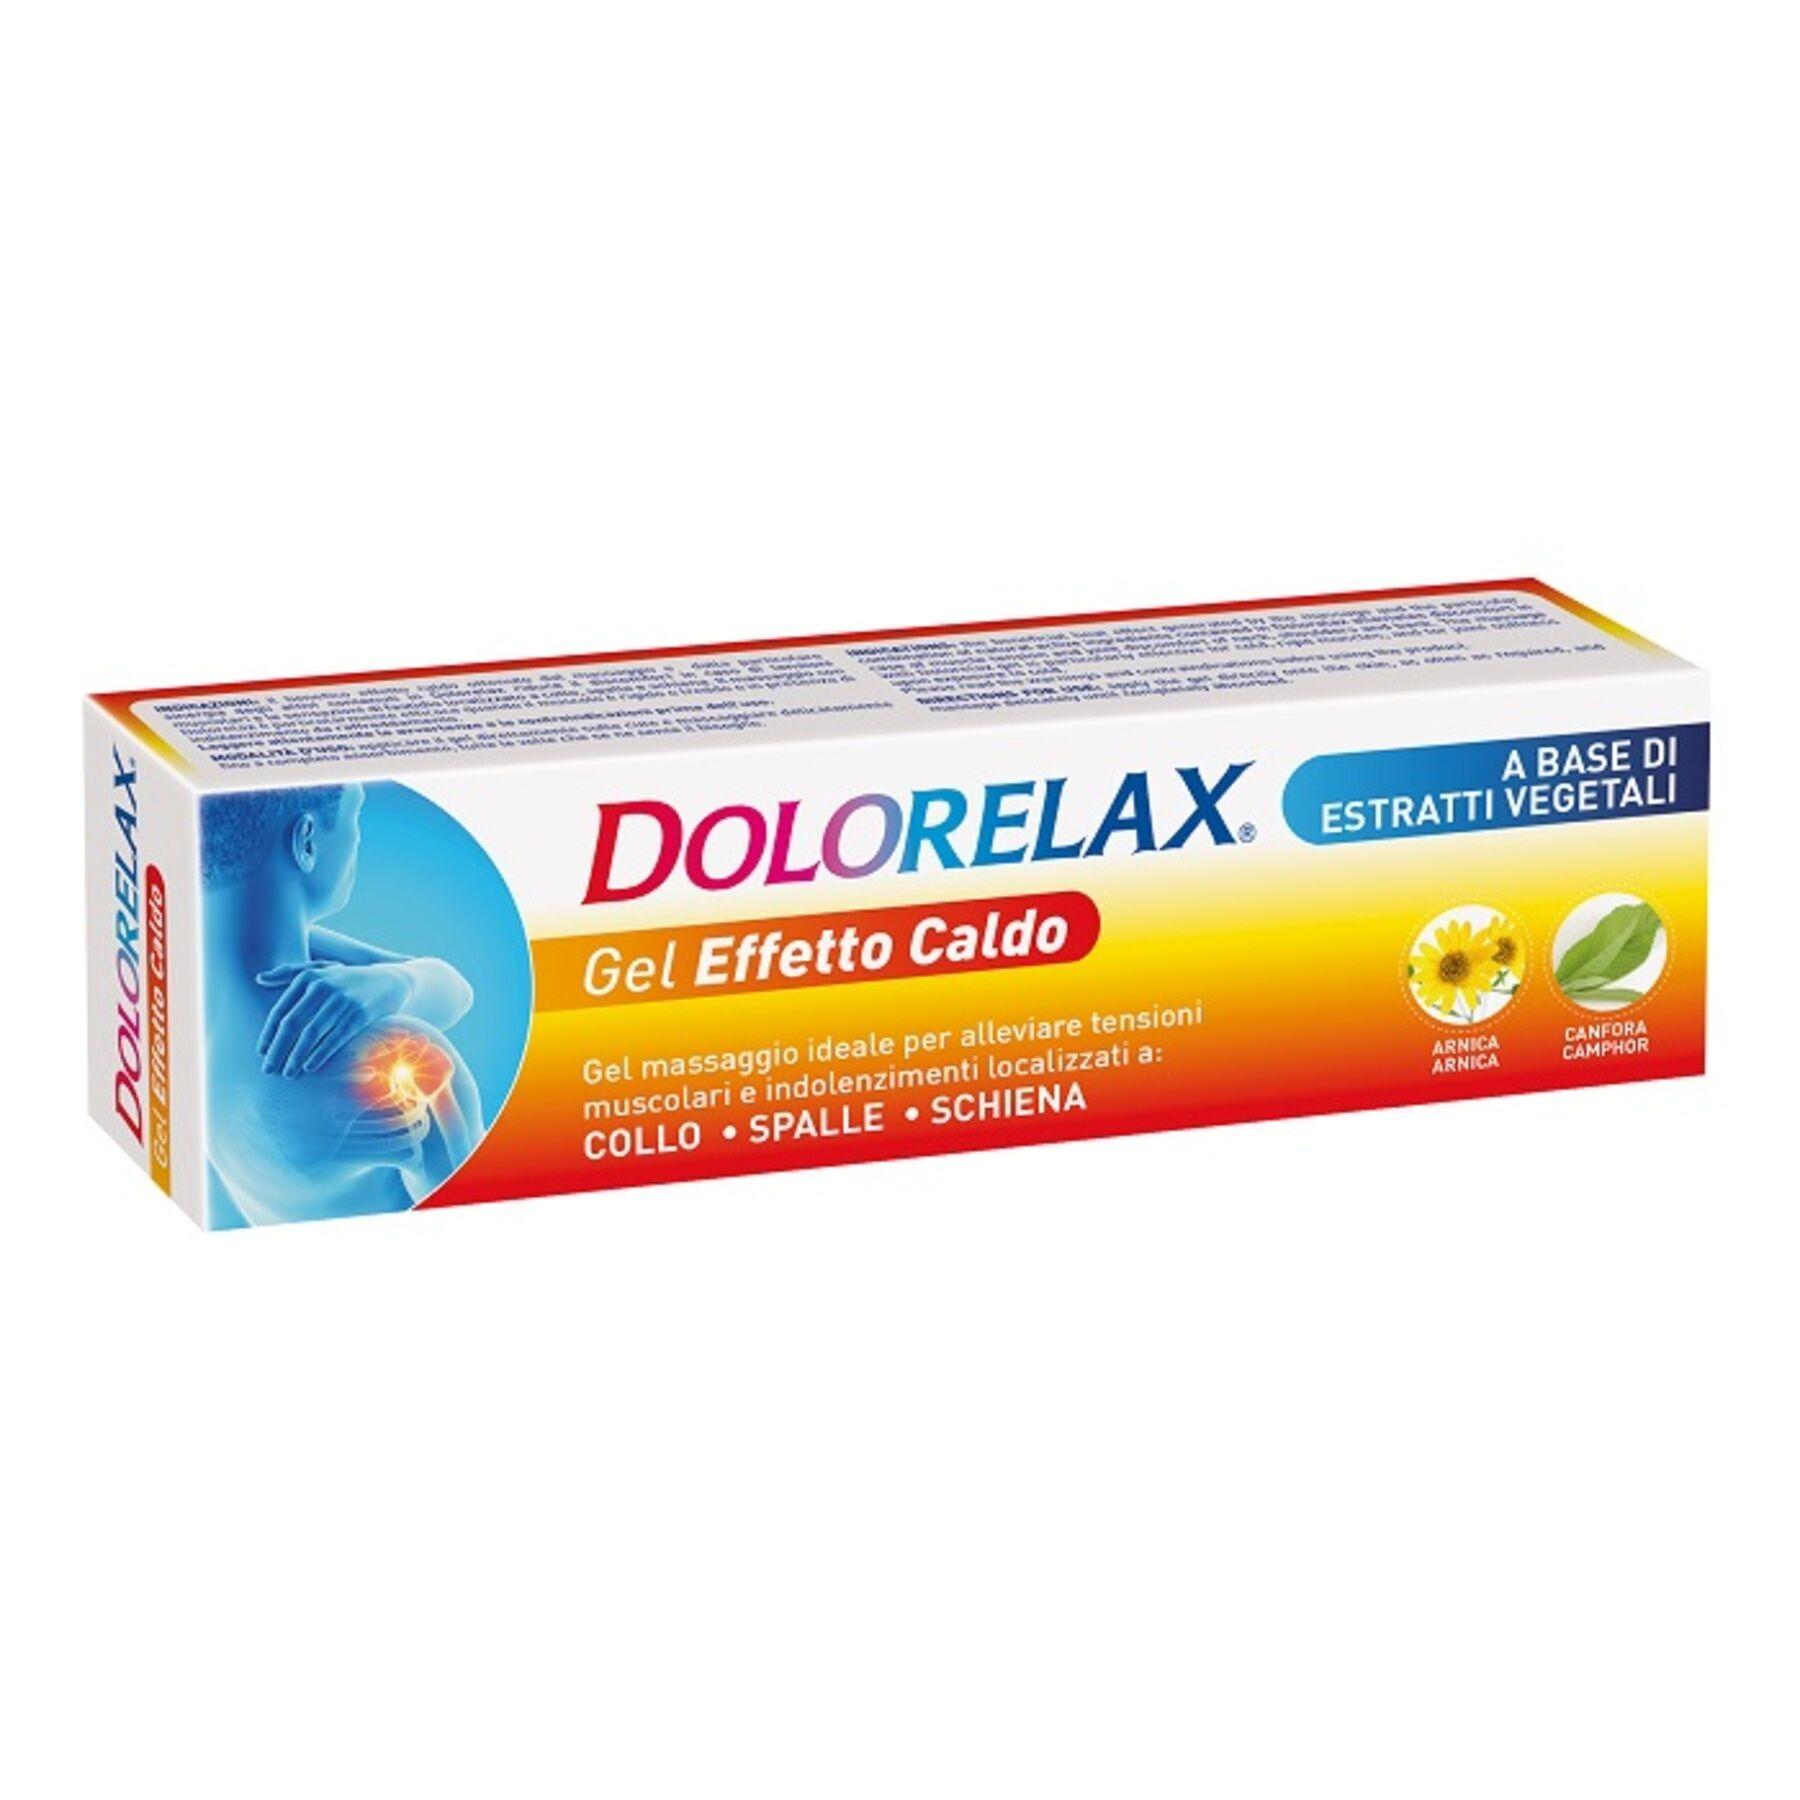 coswell spa dolorelax gel effetto caldo 75 ml